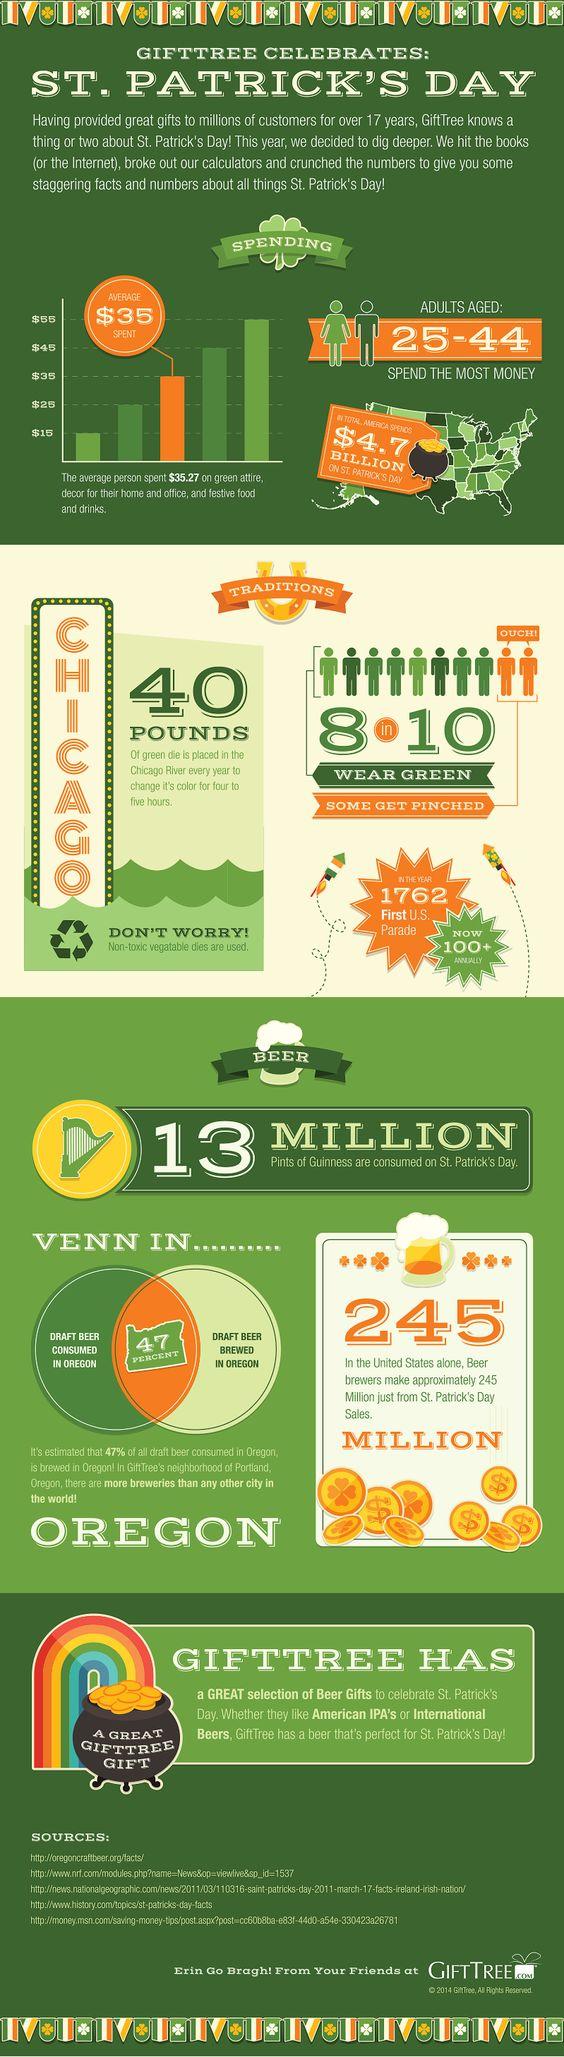 #StPatricksDay #Infographic: GiftTree Celebrates St Patricks Day (Infographic)